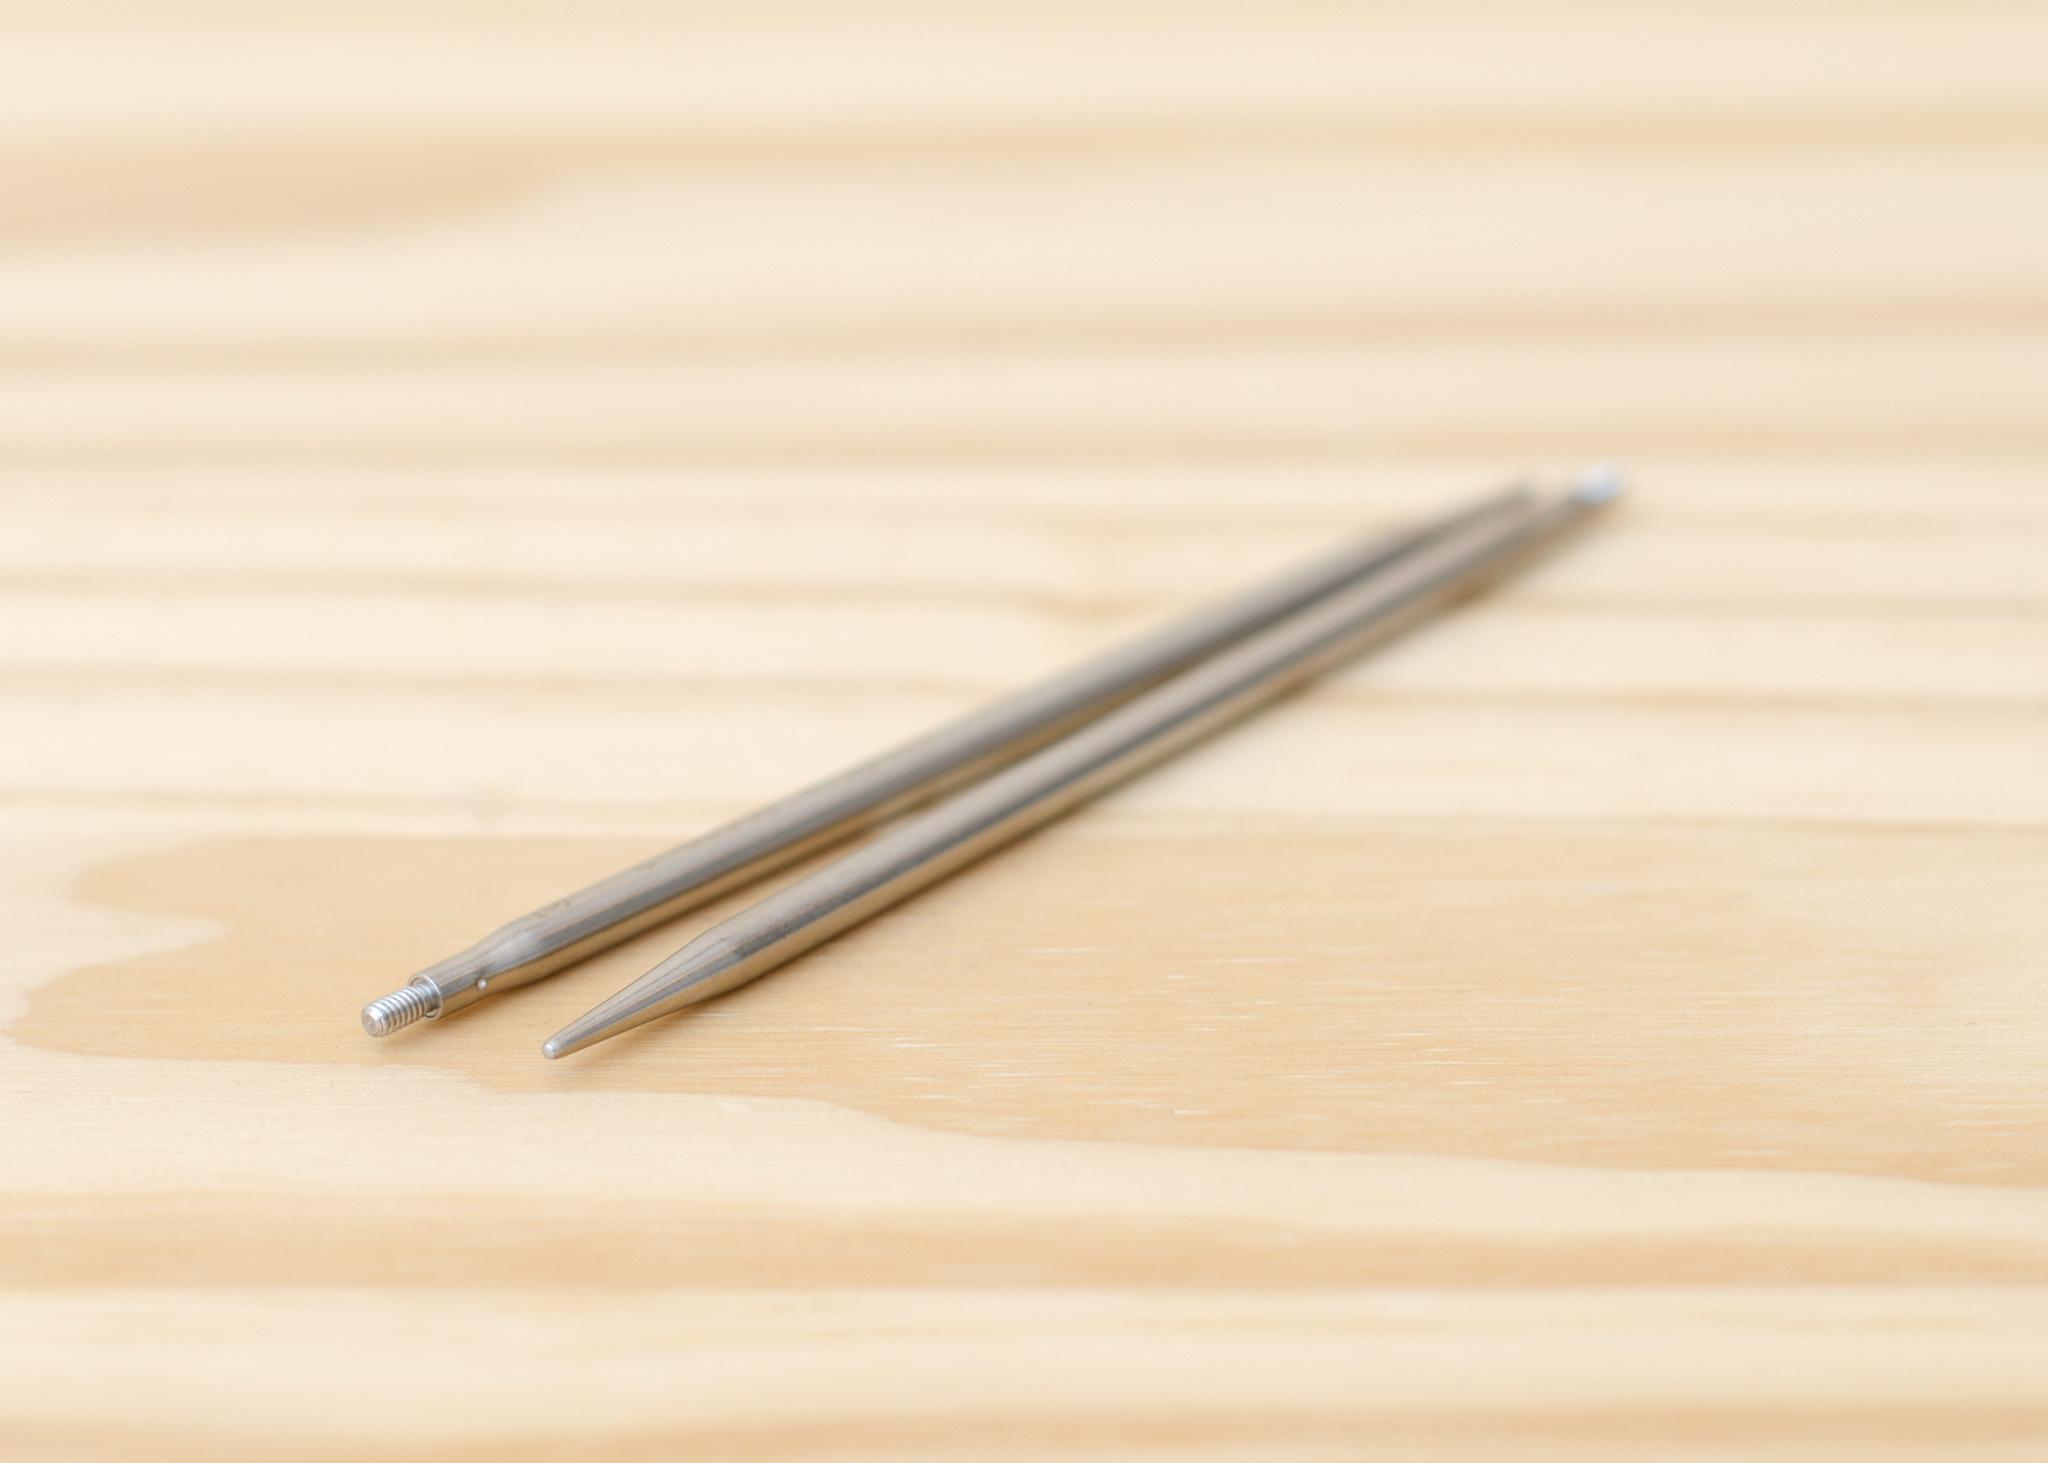 ChiaoGoo Twist Interchangeable Stainless Steel Tips : Small : US 4/3.5mm